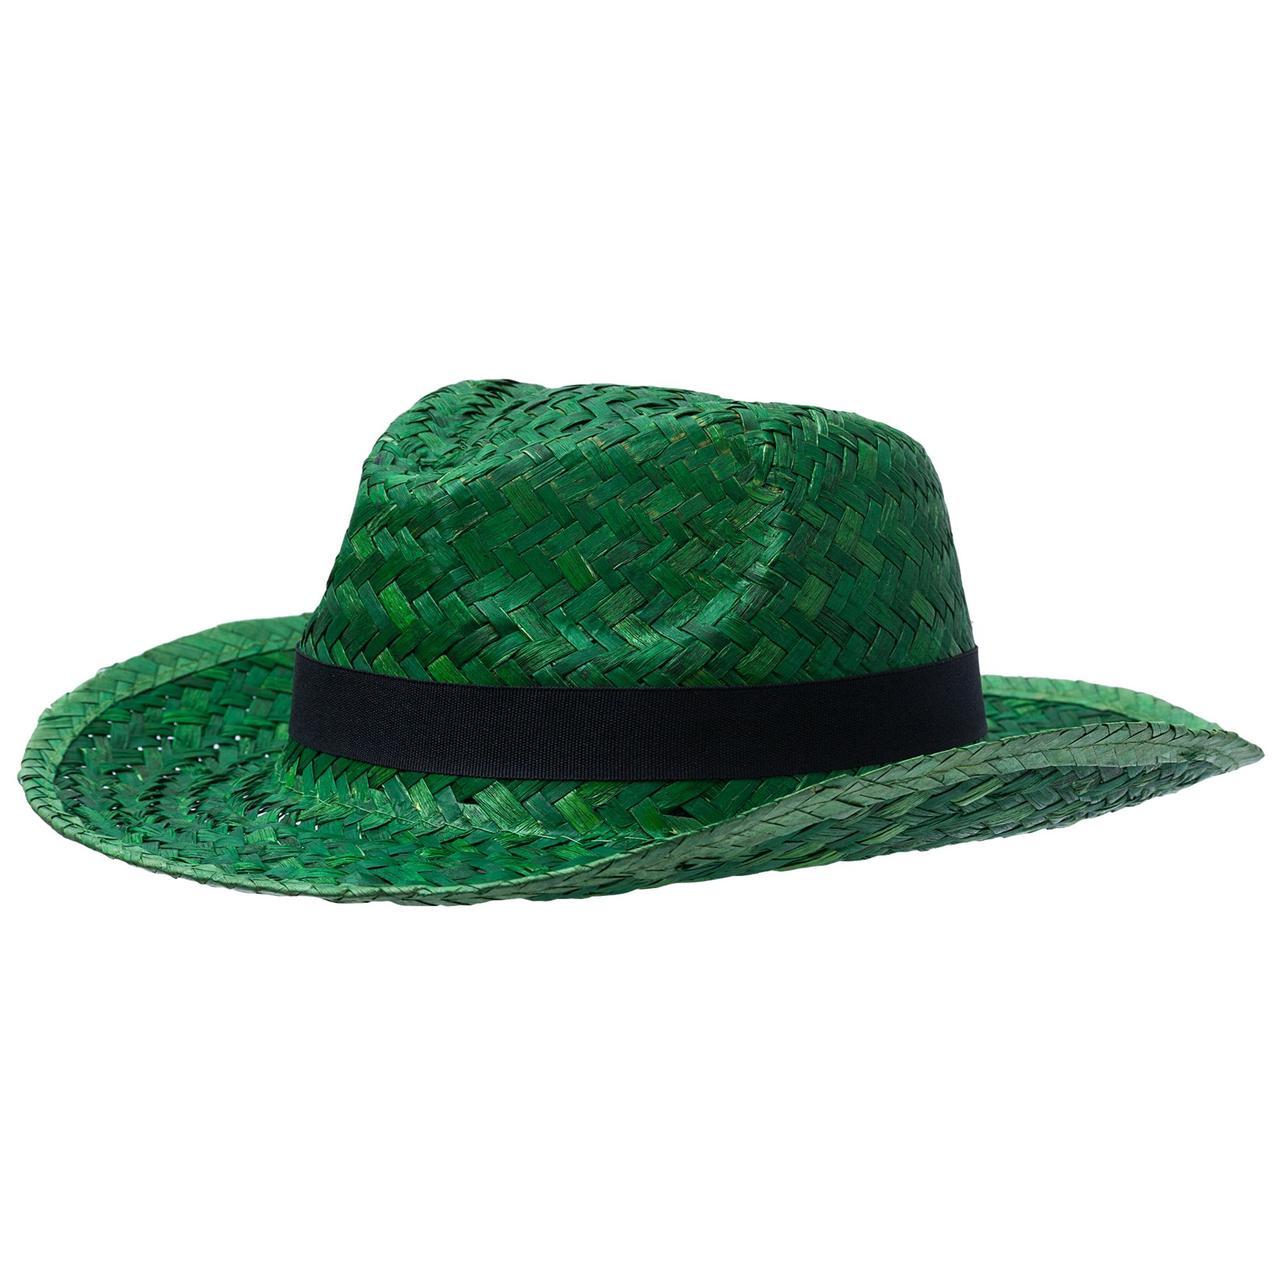 Шляпа Daydream, зеленая с черной лентой (артикул 6982.93)